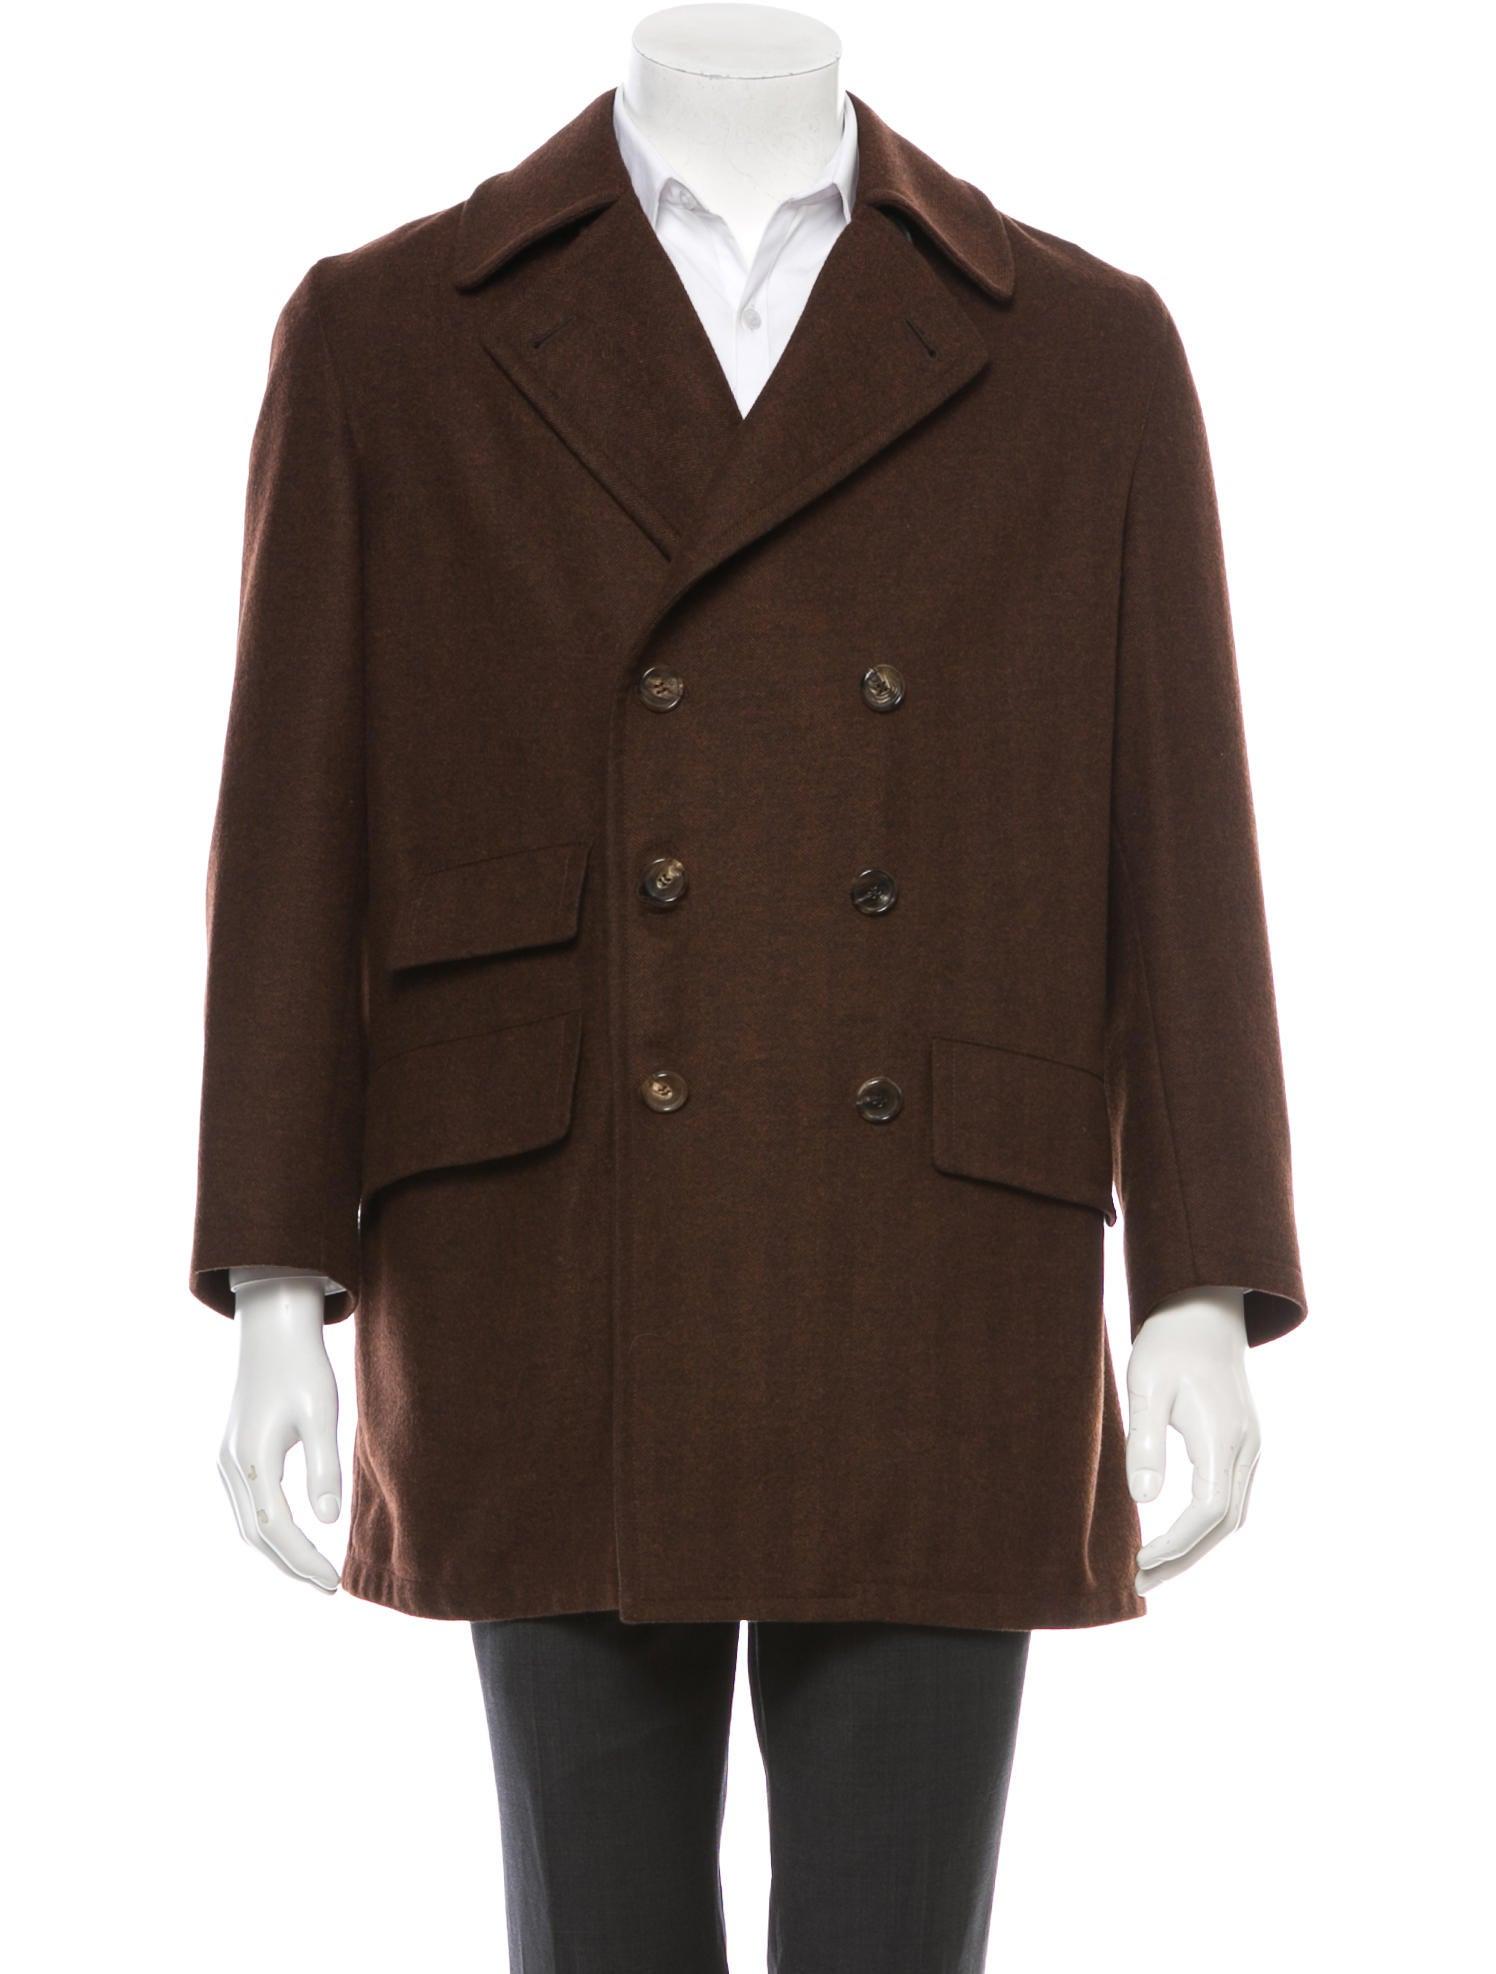 Kiton Cashmere Vicu 241 A Jacket Clothing Kit20104 The